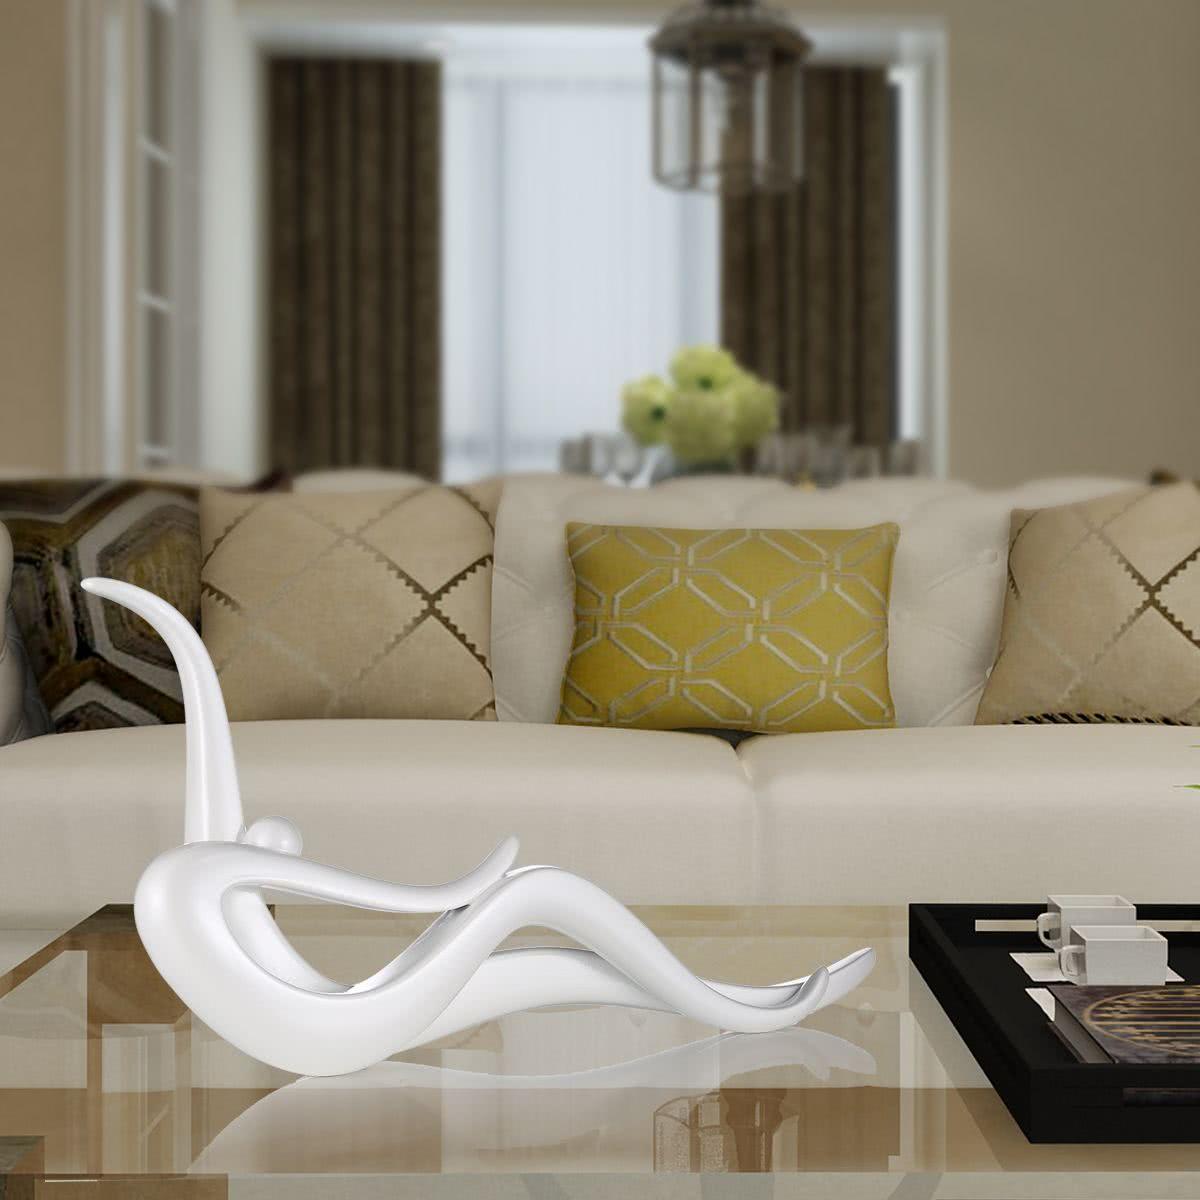 Detr s movimiento tomfeel fibra de vidrio escultura - Decoracion hogar original ...